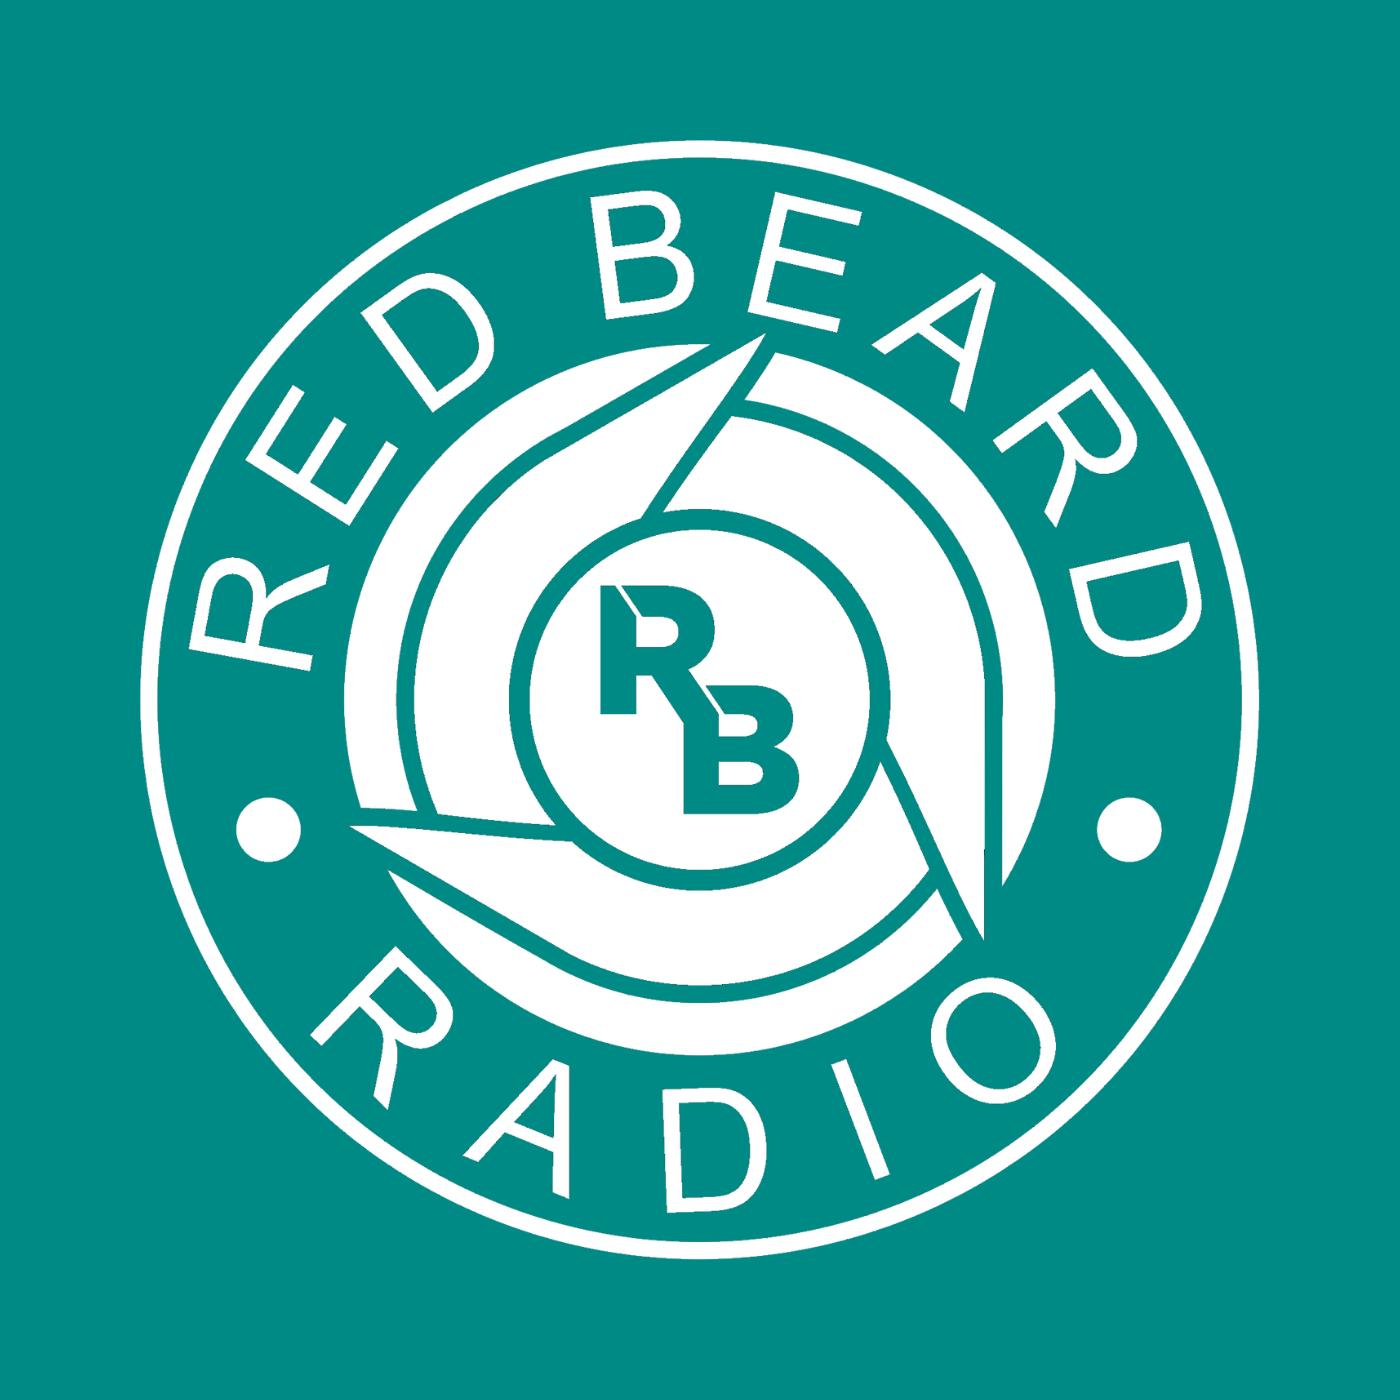 Red Beard Radio show art